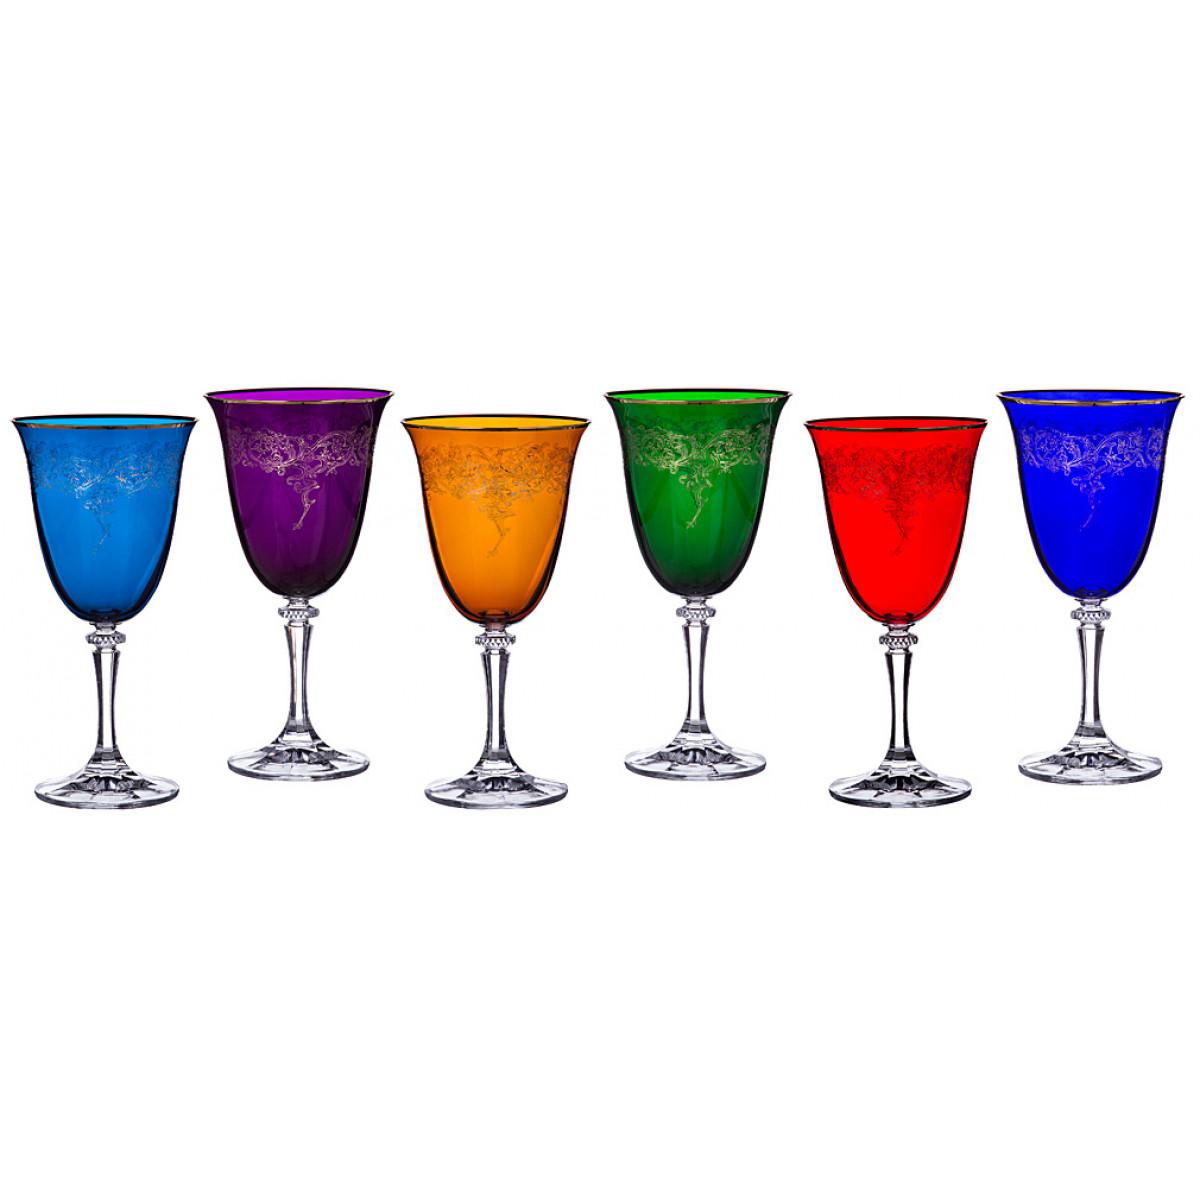 {} Crystalite Bohemia Набор бокалов для вина Peggy (20 см - 6 шт) набор бокалов для бренди 6 шт crystalite bohemia набор бокалов для бренди 6 шт